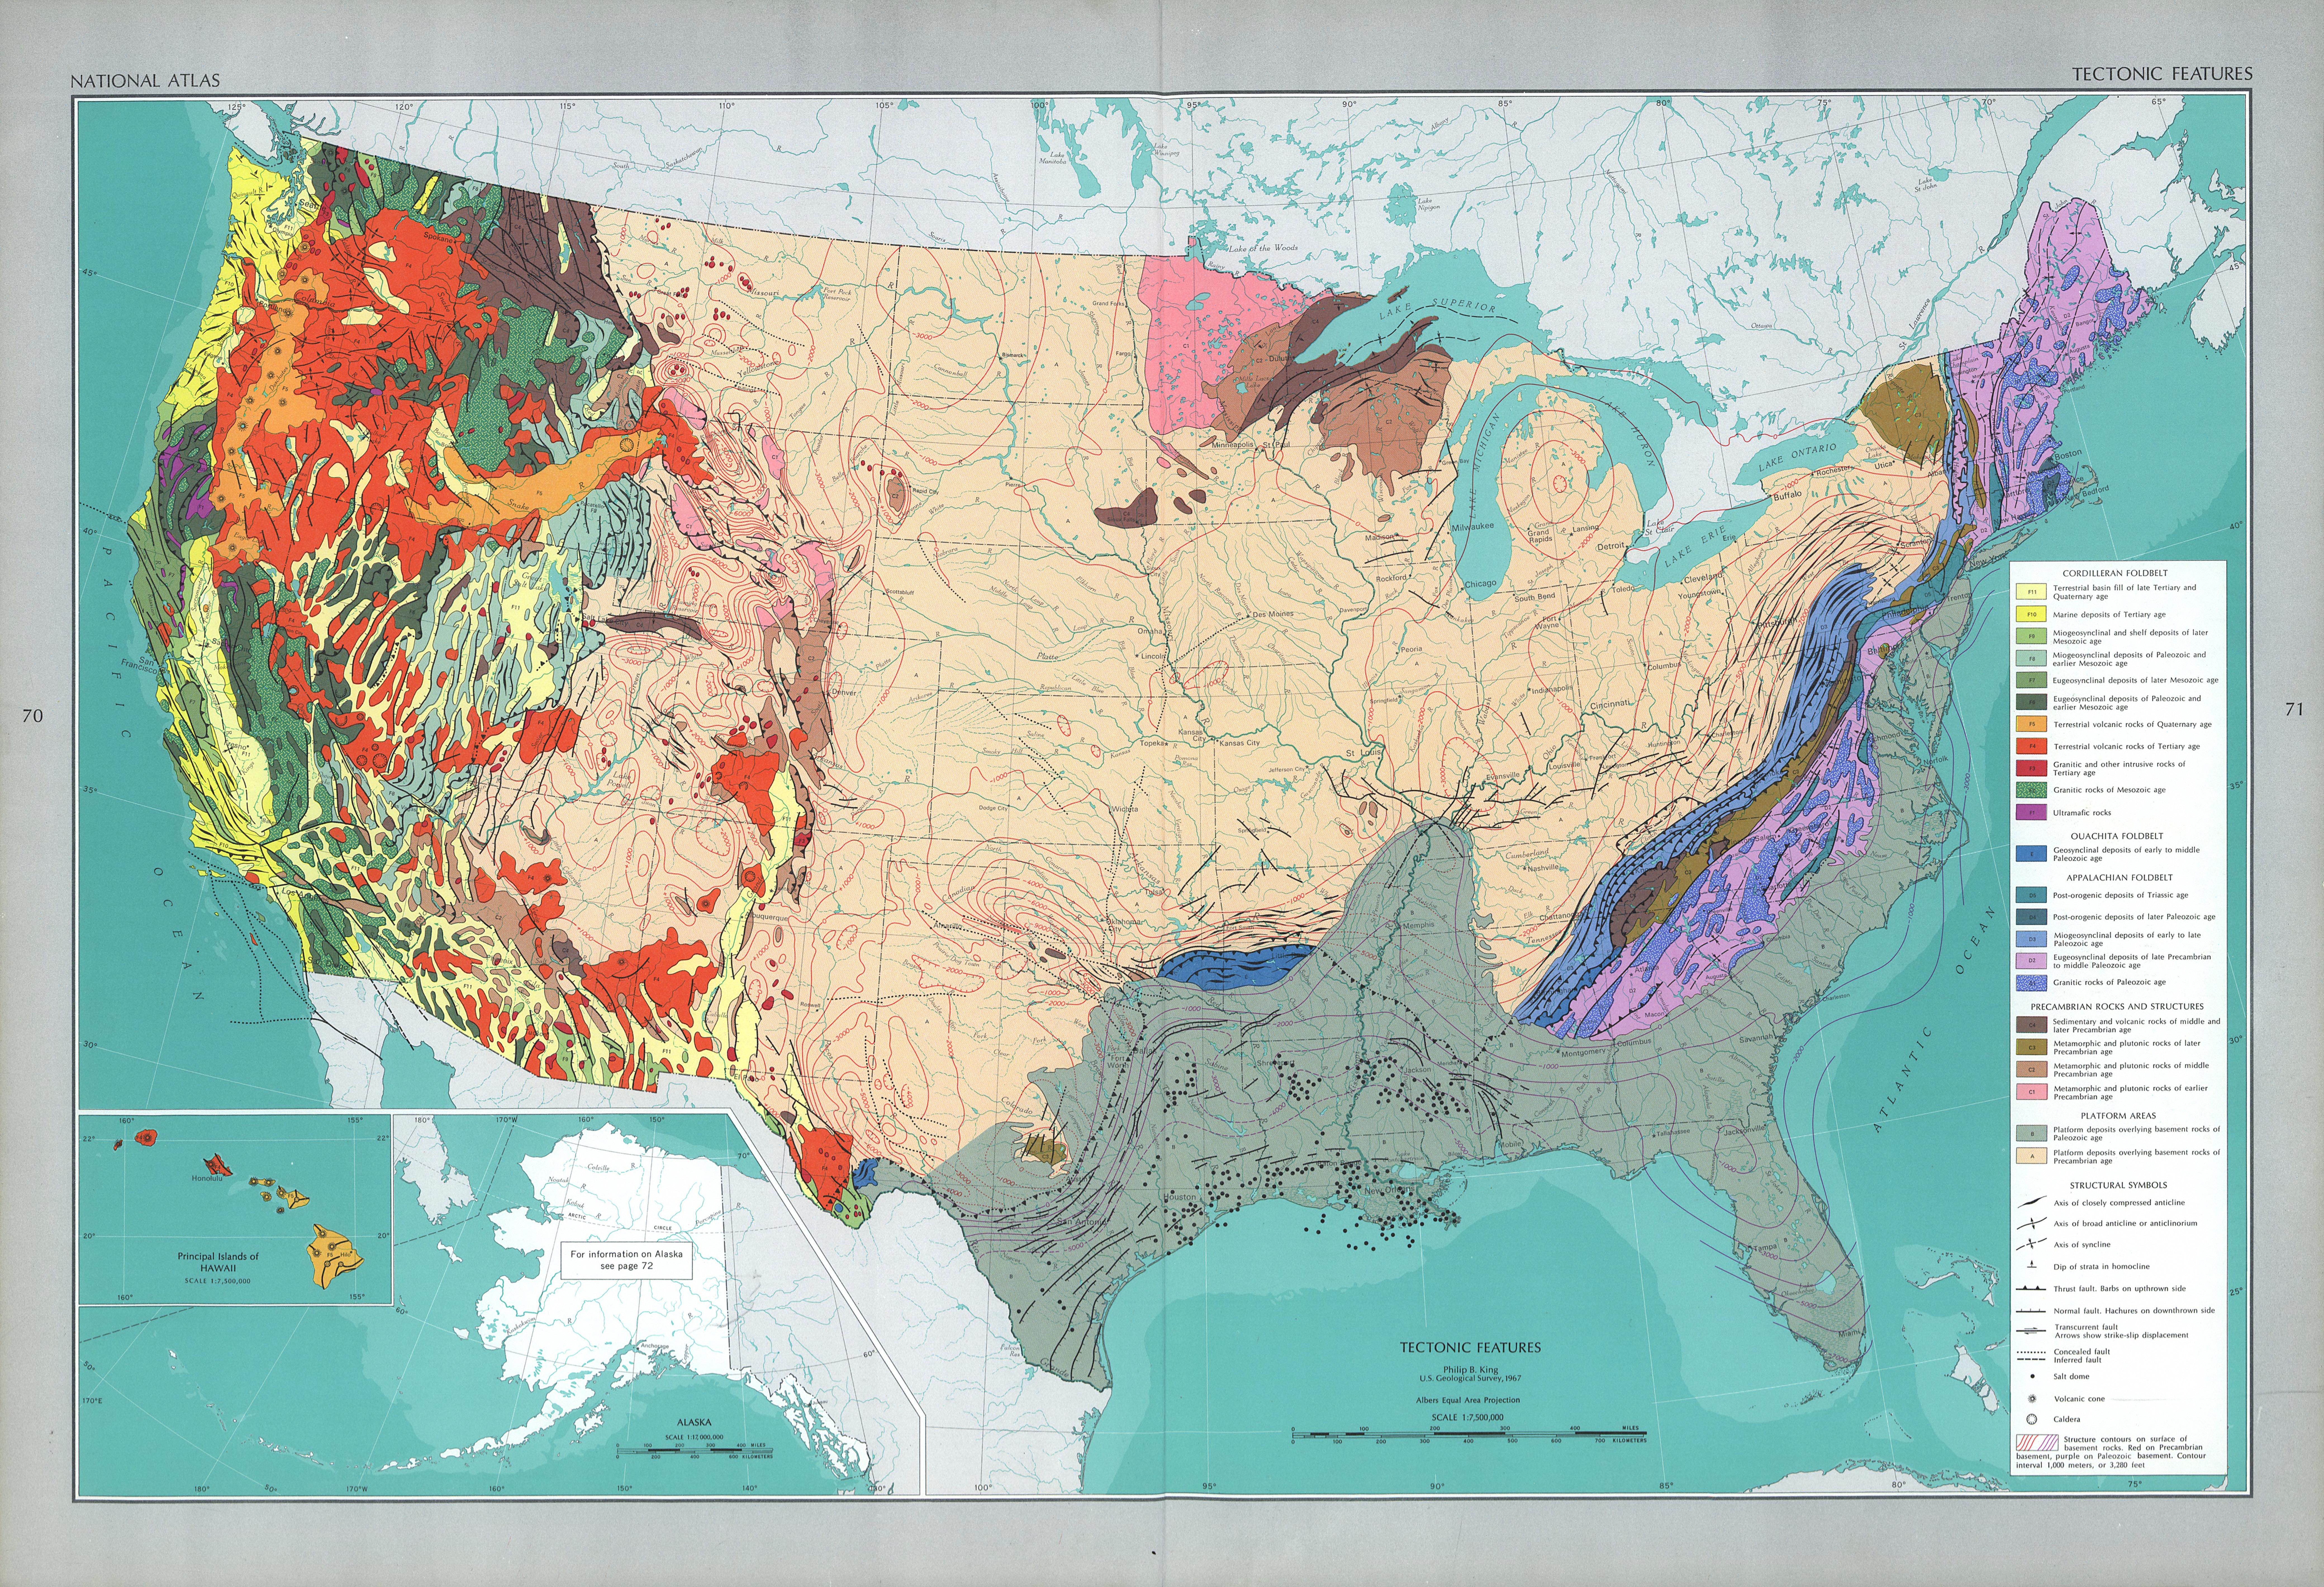 Mapa de las Características Tectónicas de Estados Unidos